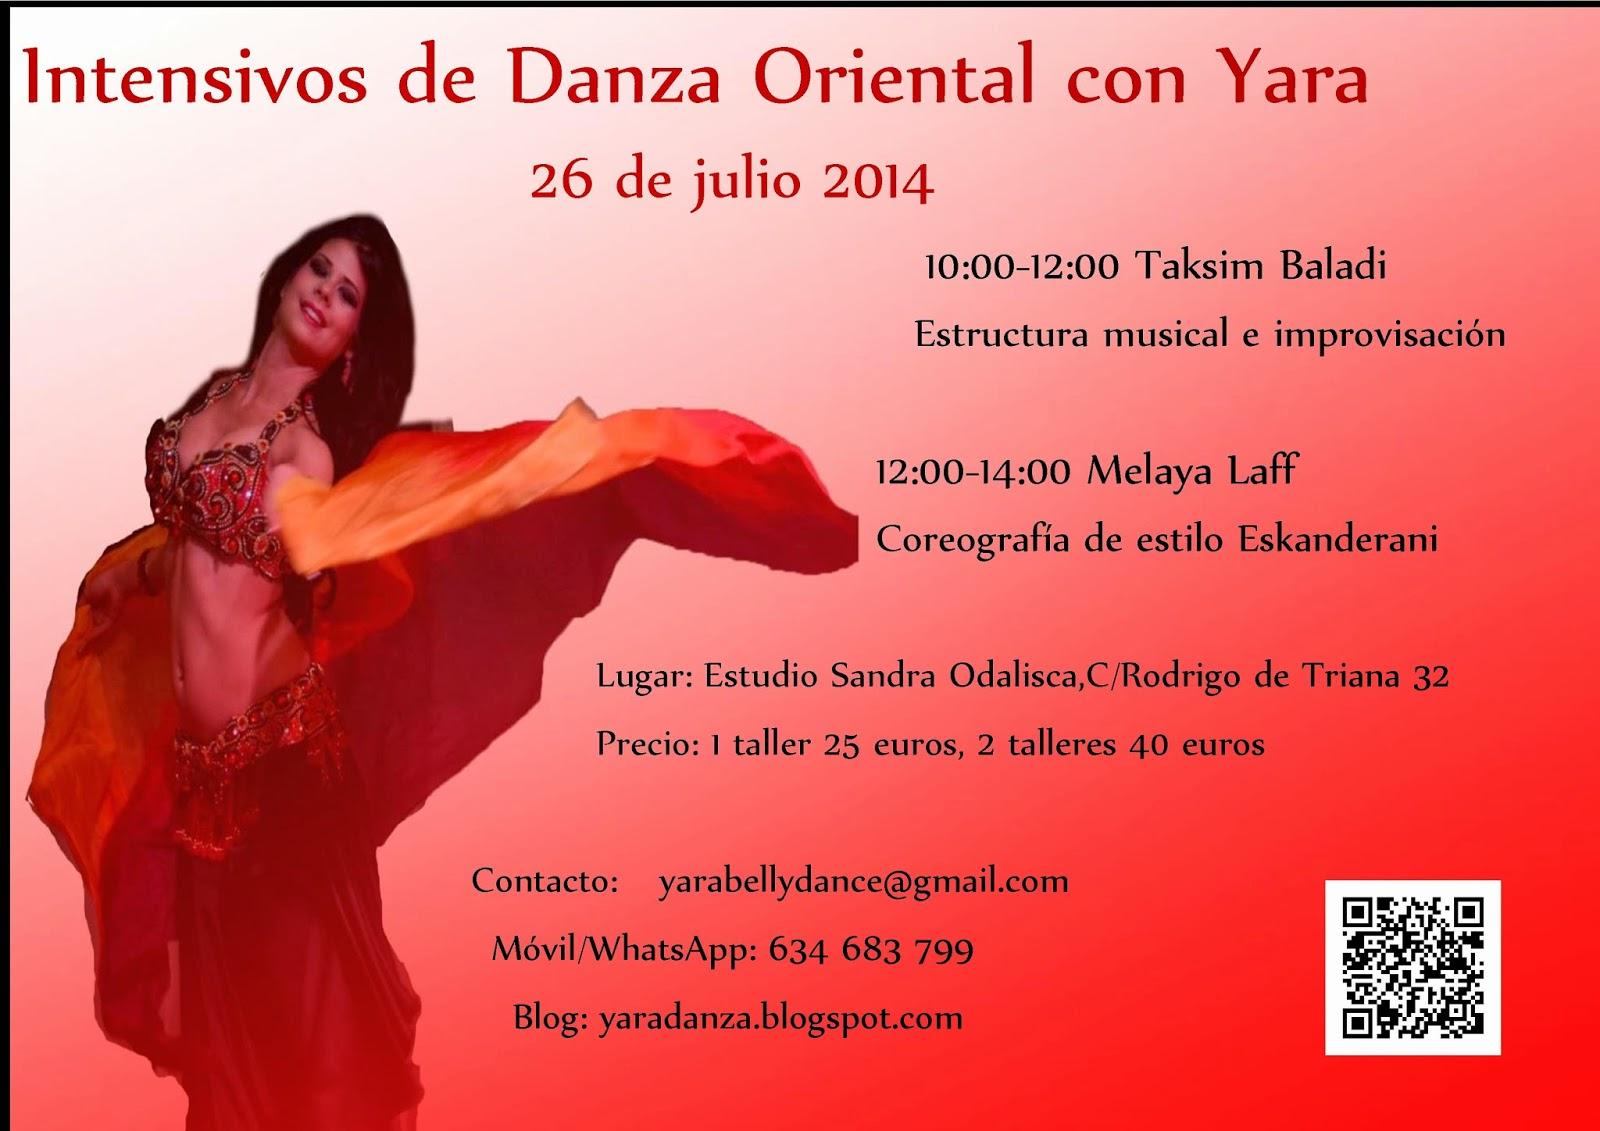 danza oriental sevilla, danza del vientre sevilla, cursillos, talleres, profesora danza del vientre sevilla, bellydance